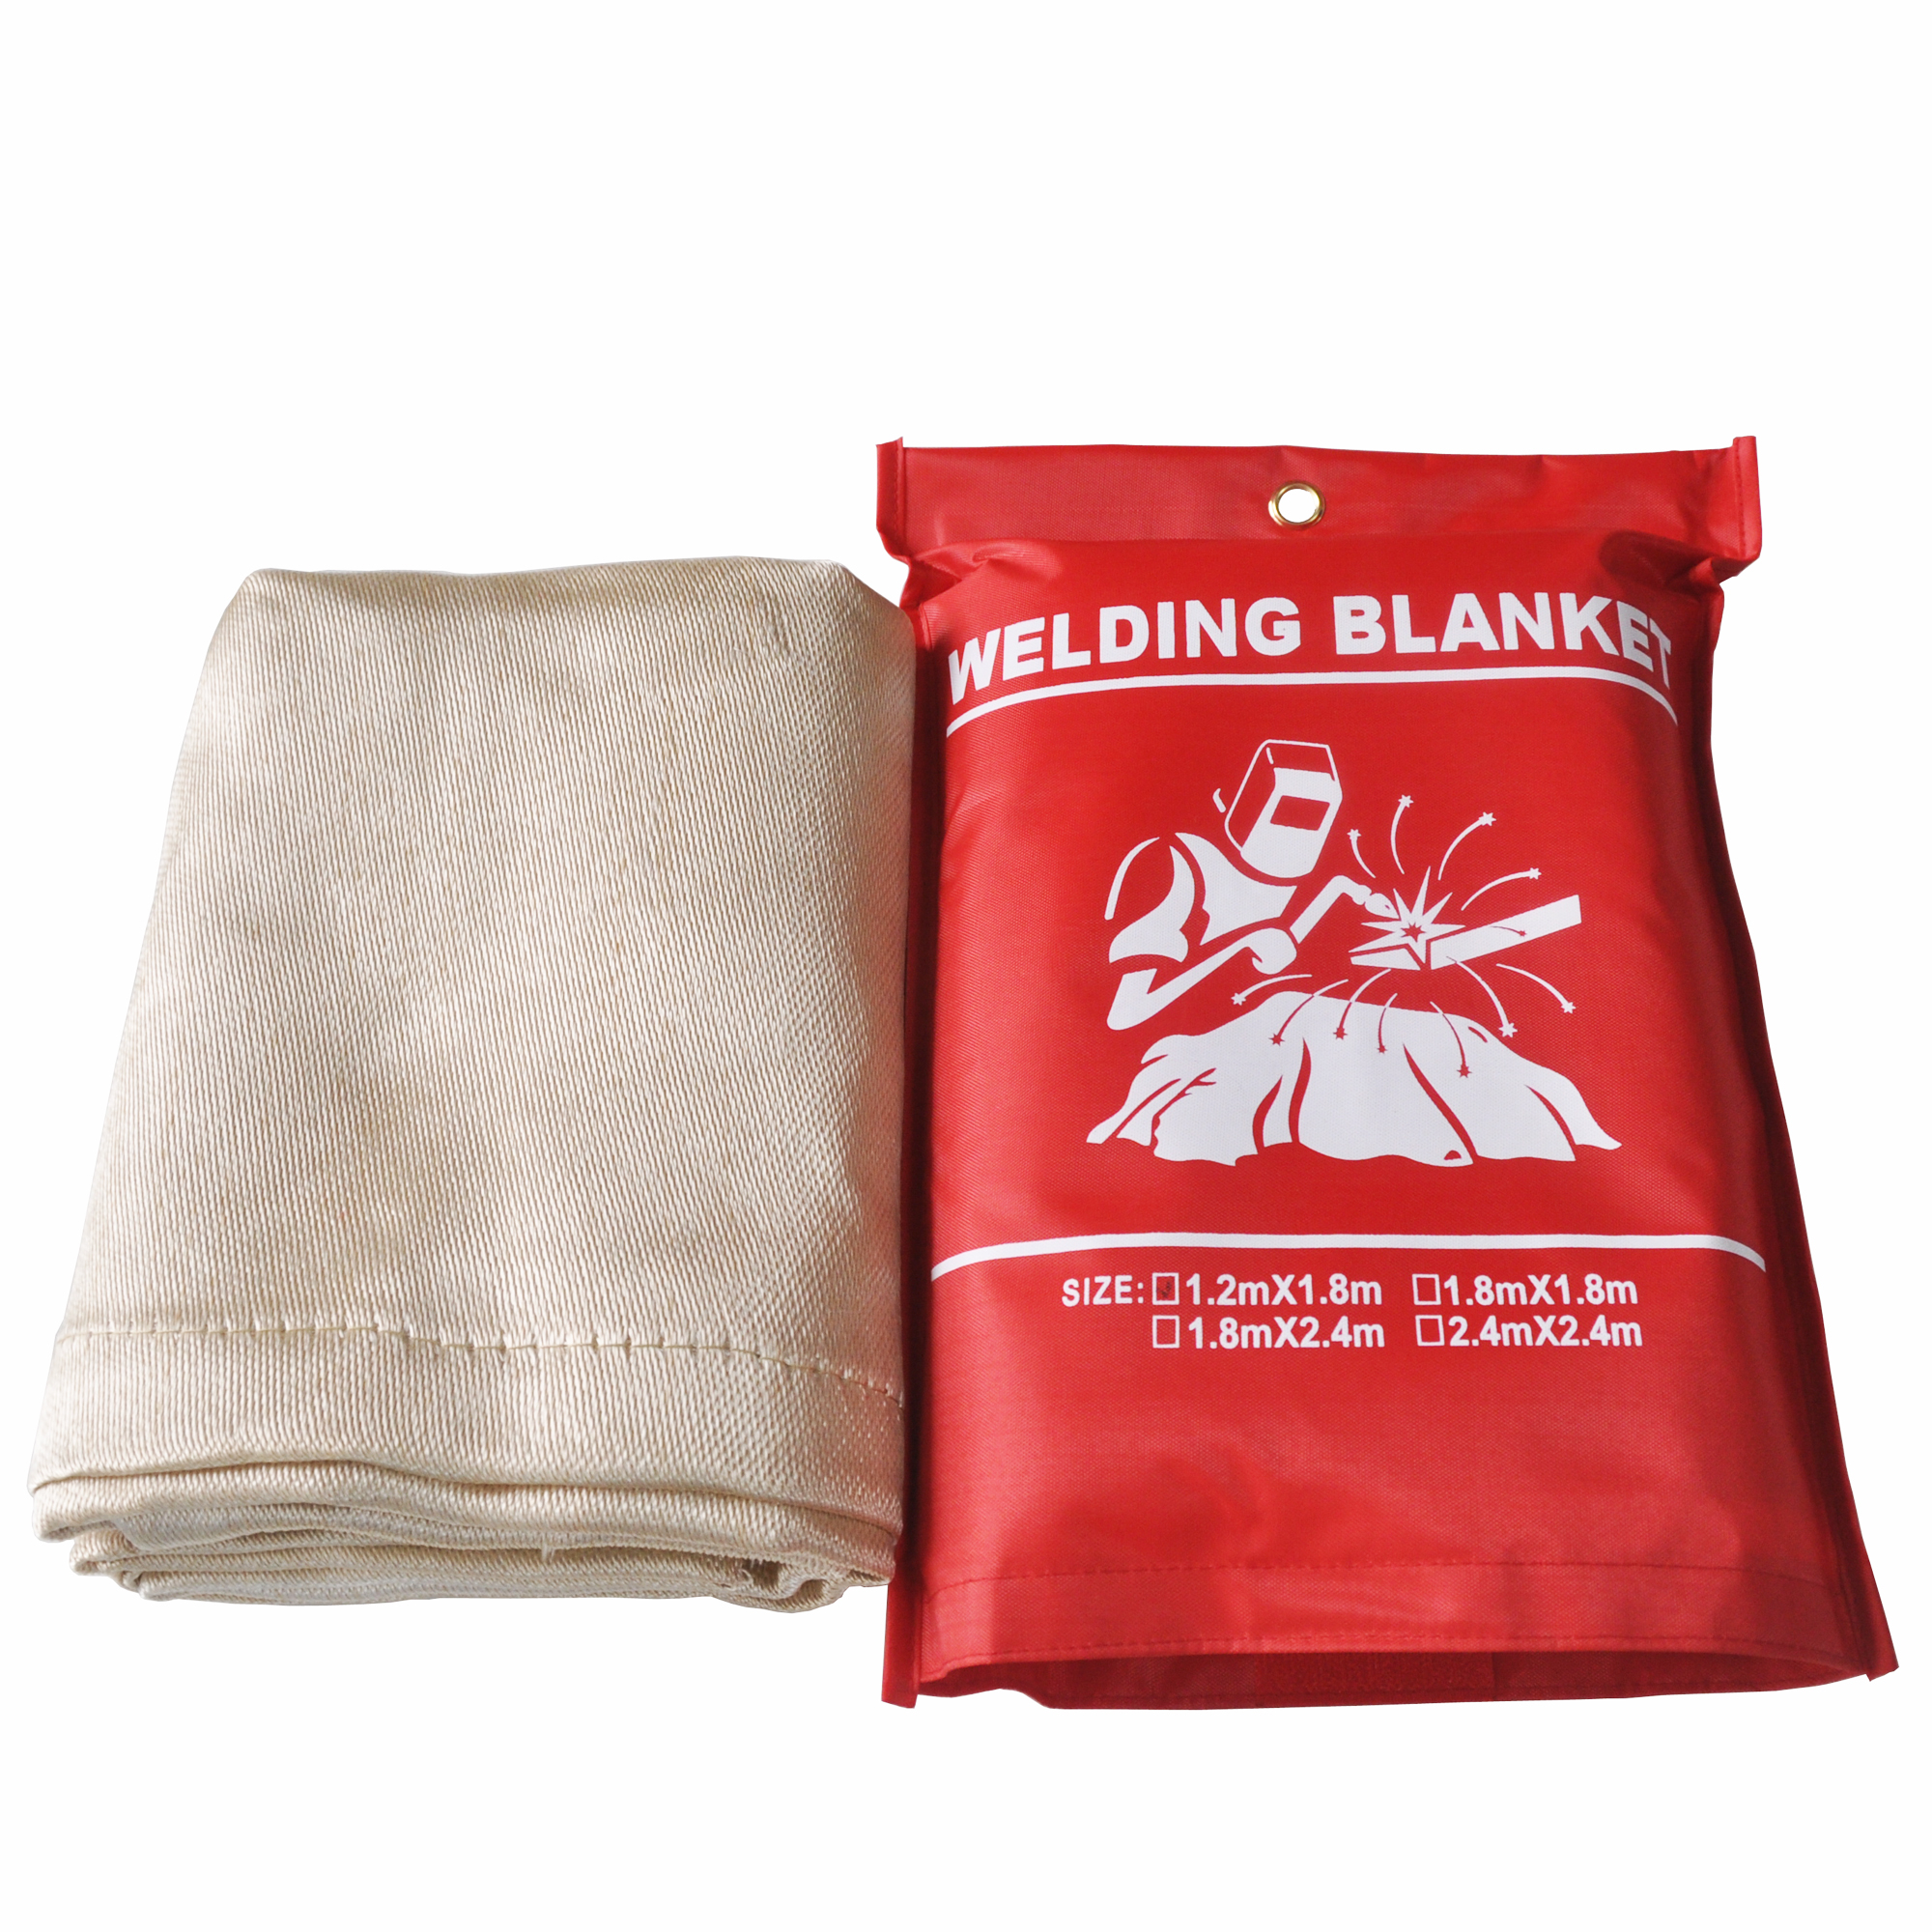 1m x 1m Fire Blanket Fiber Glass Flame Retardant Welding Cover Protective Fabric